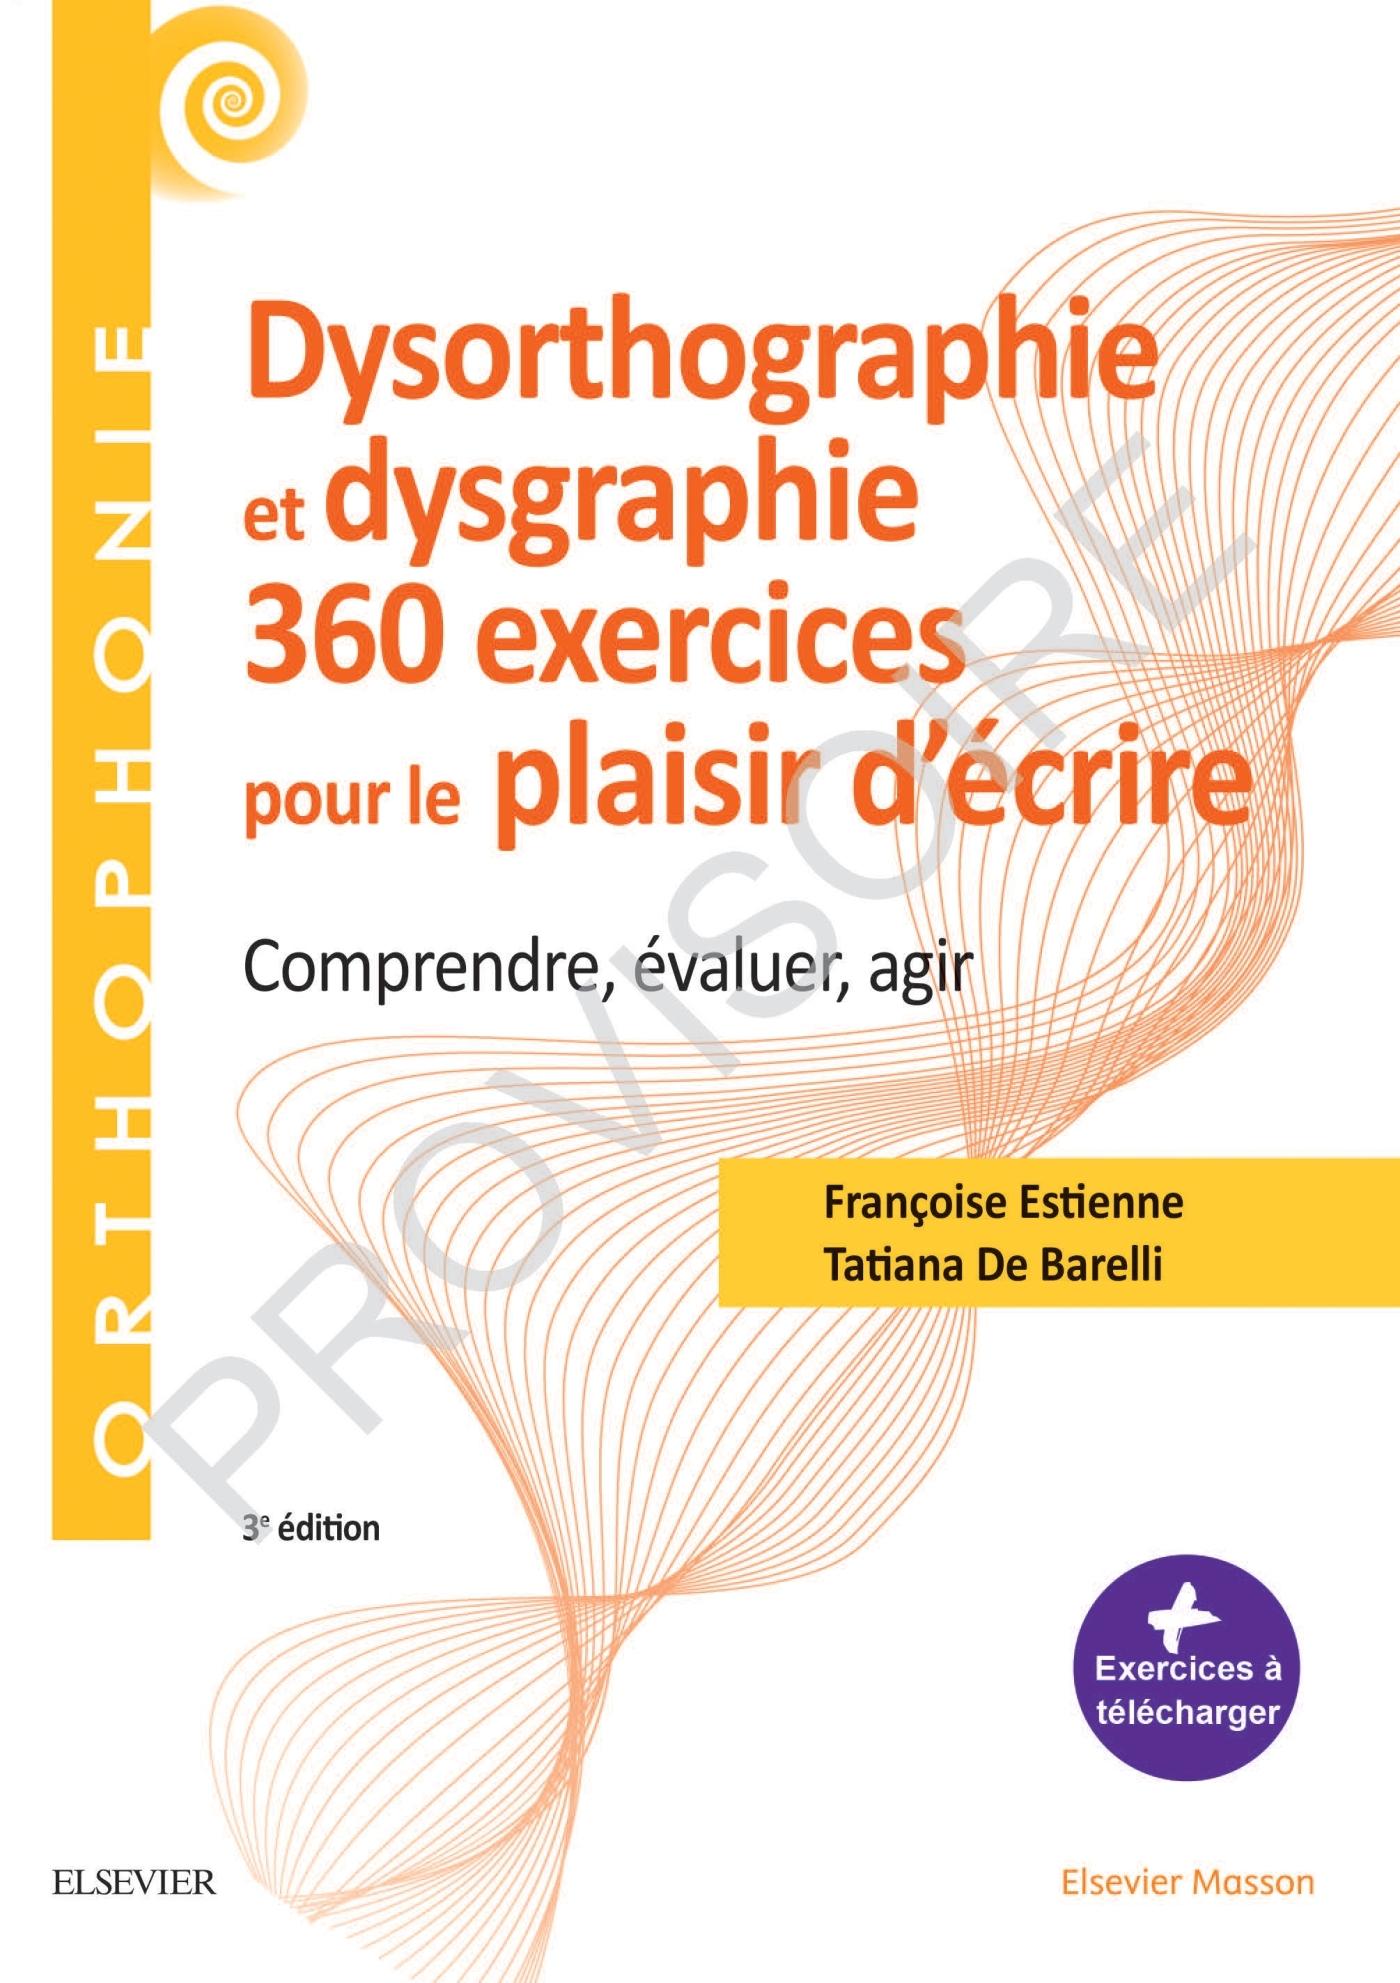 360 EXERCICES EN DYSORTHOGRAPHIE ET DYSGRAPHIE - COMPRENDRE, EVALUER, AGIR